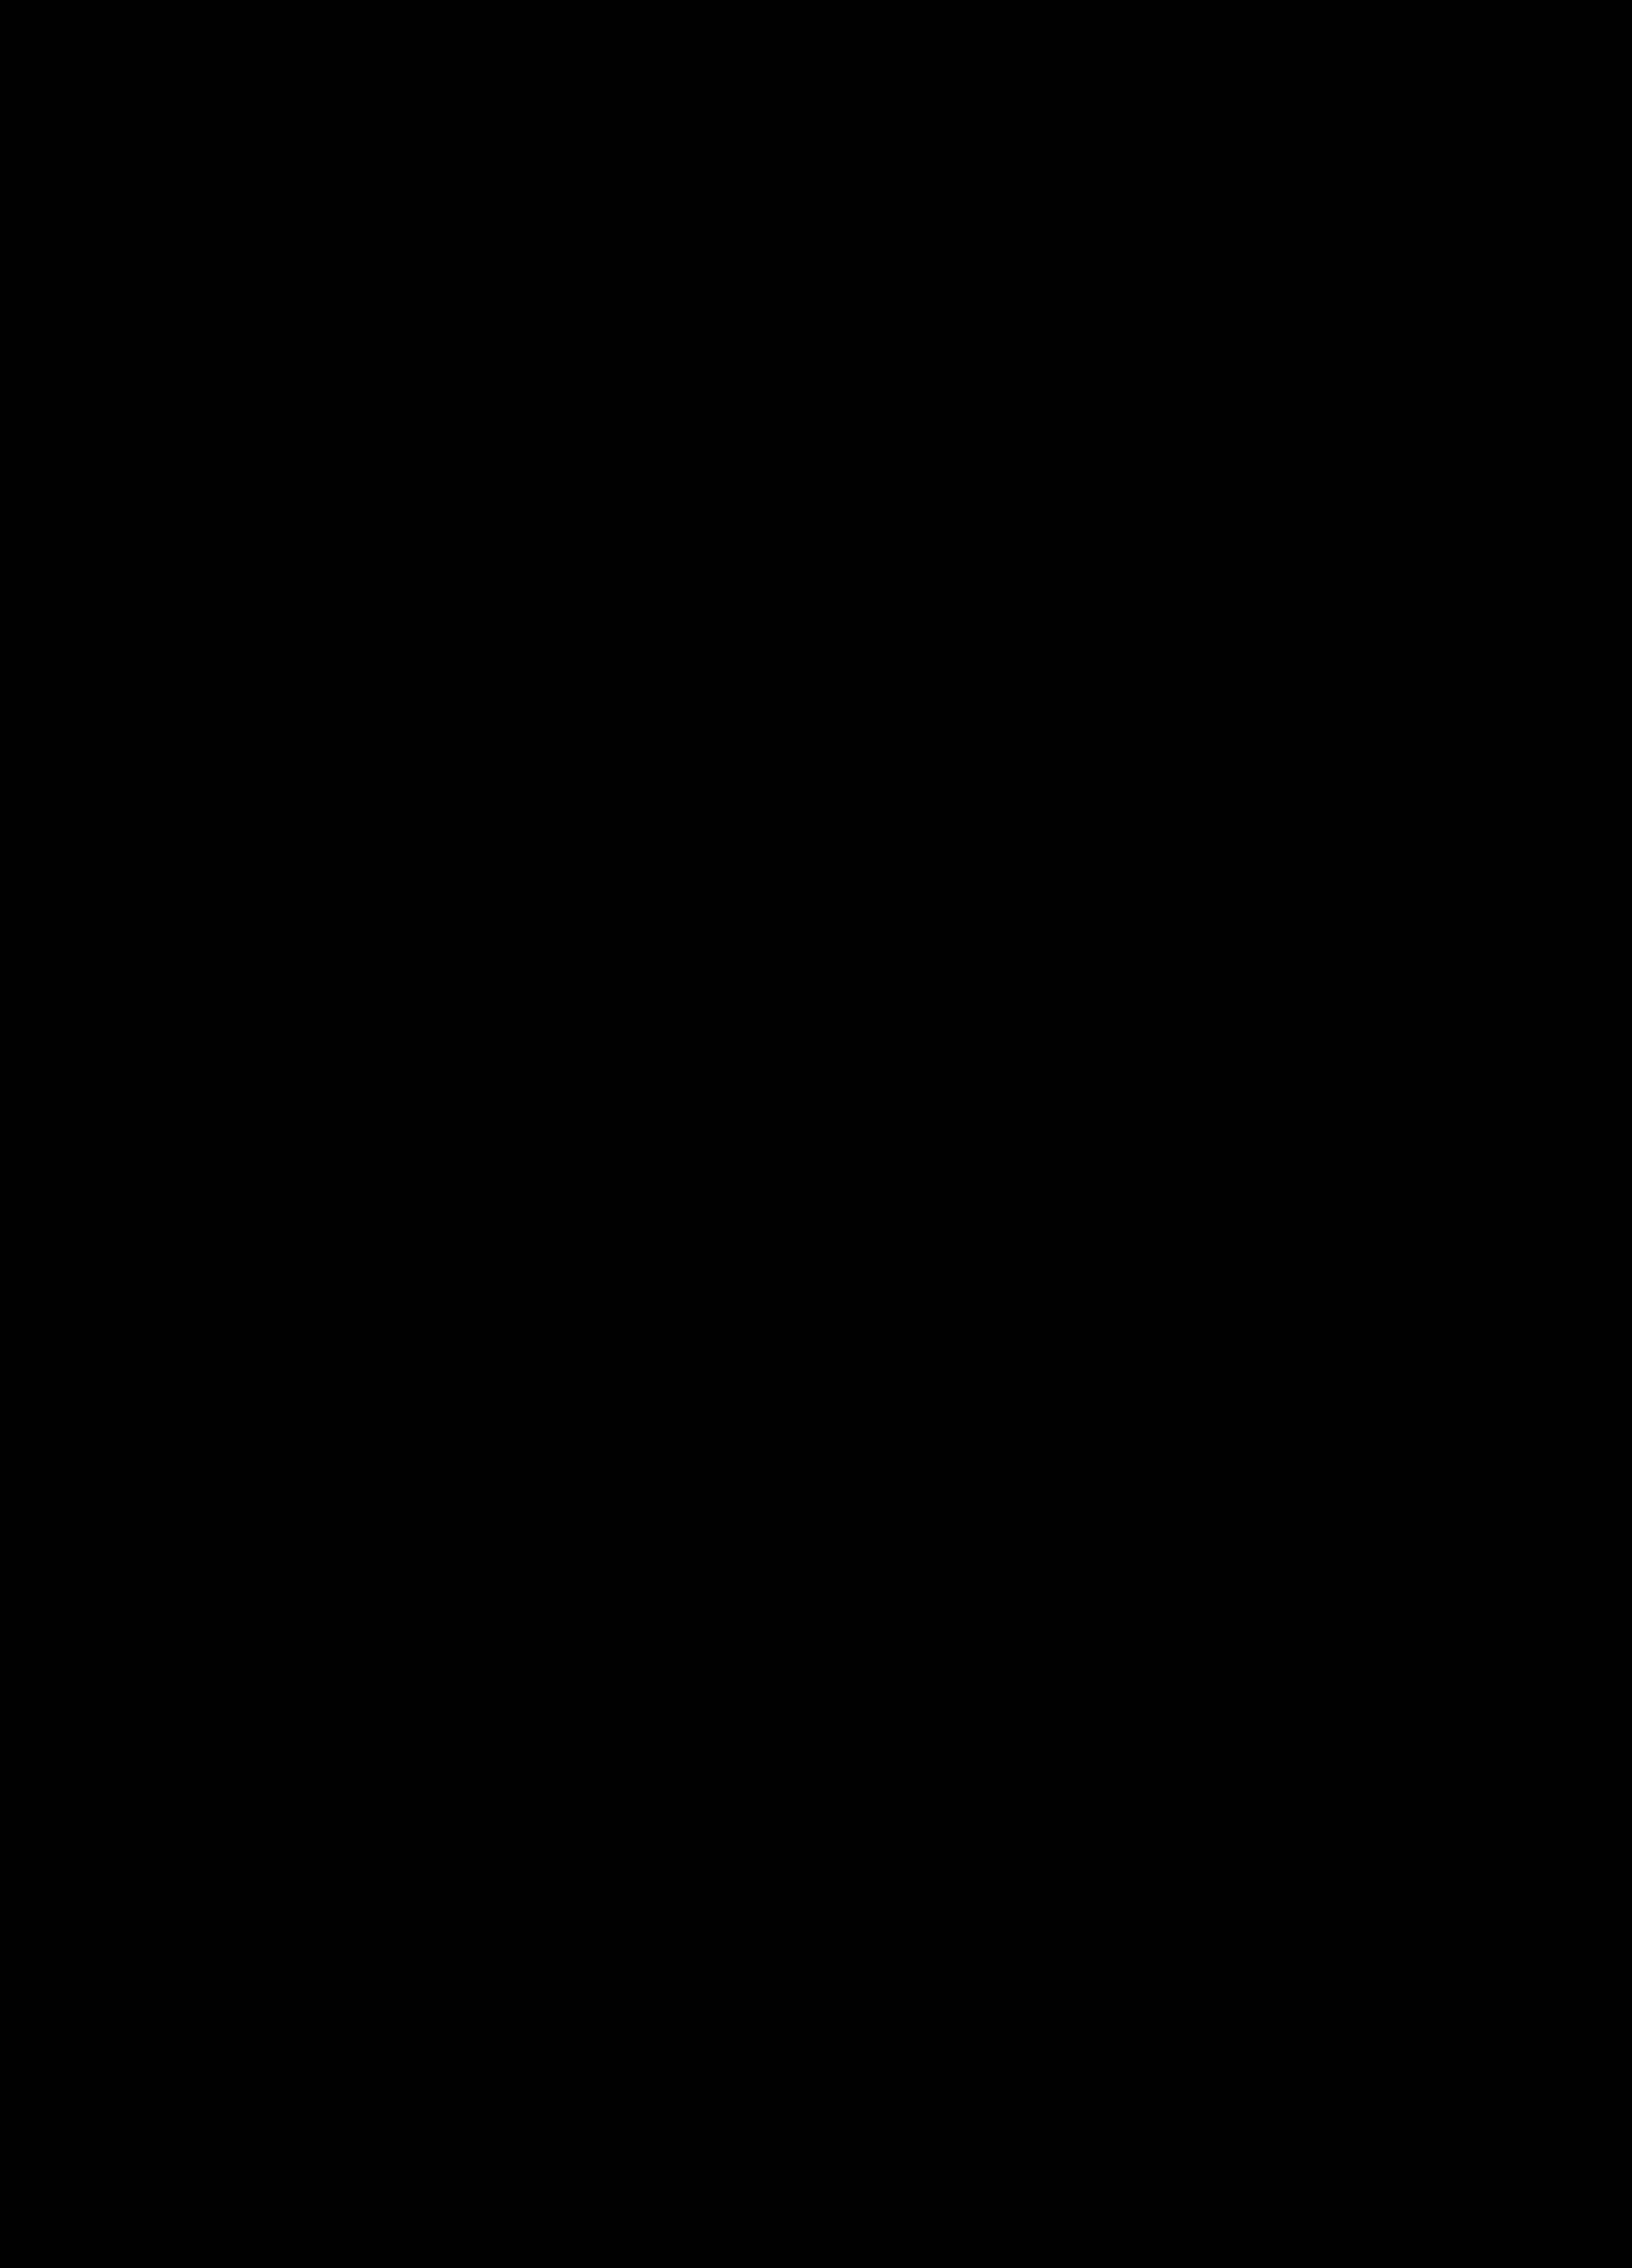 Silhouette 2008